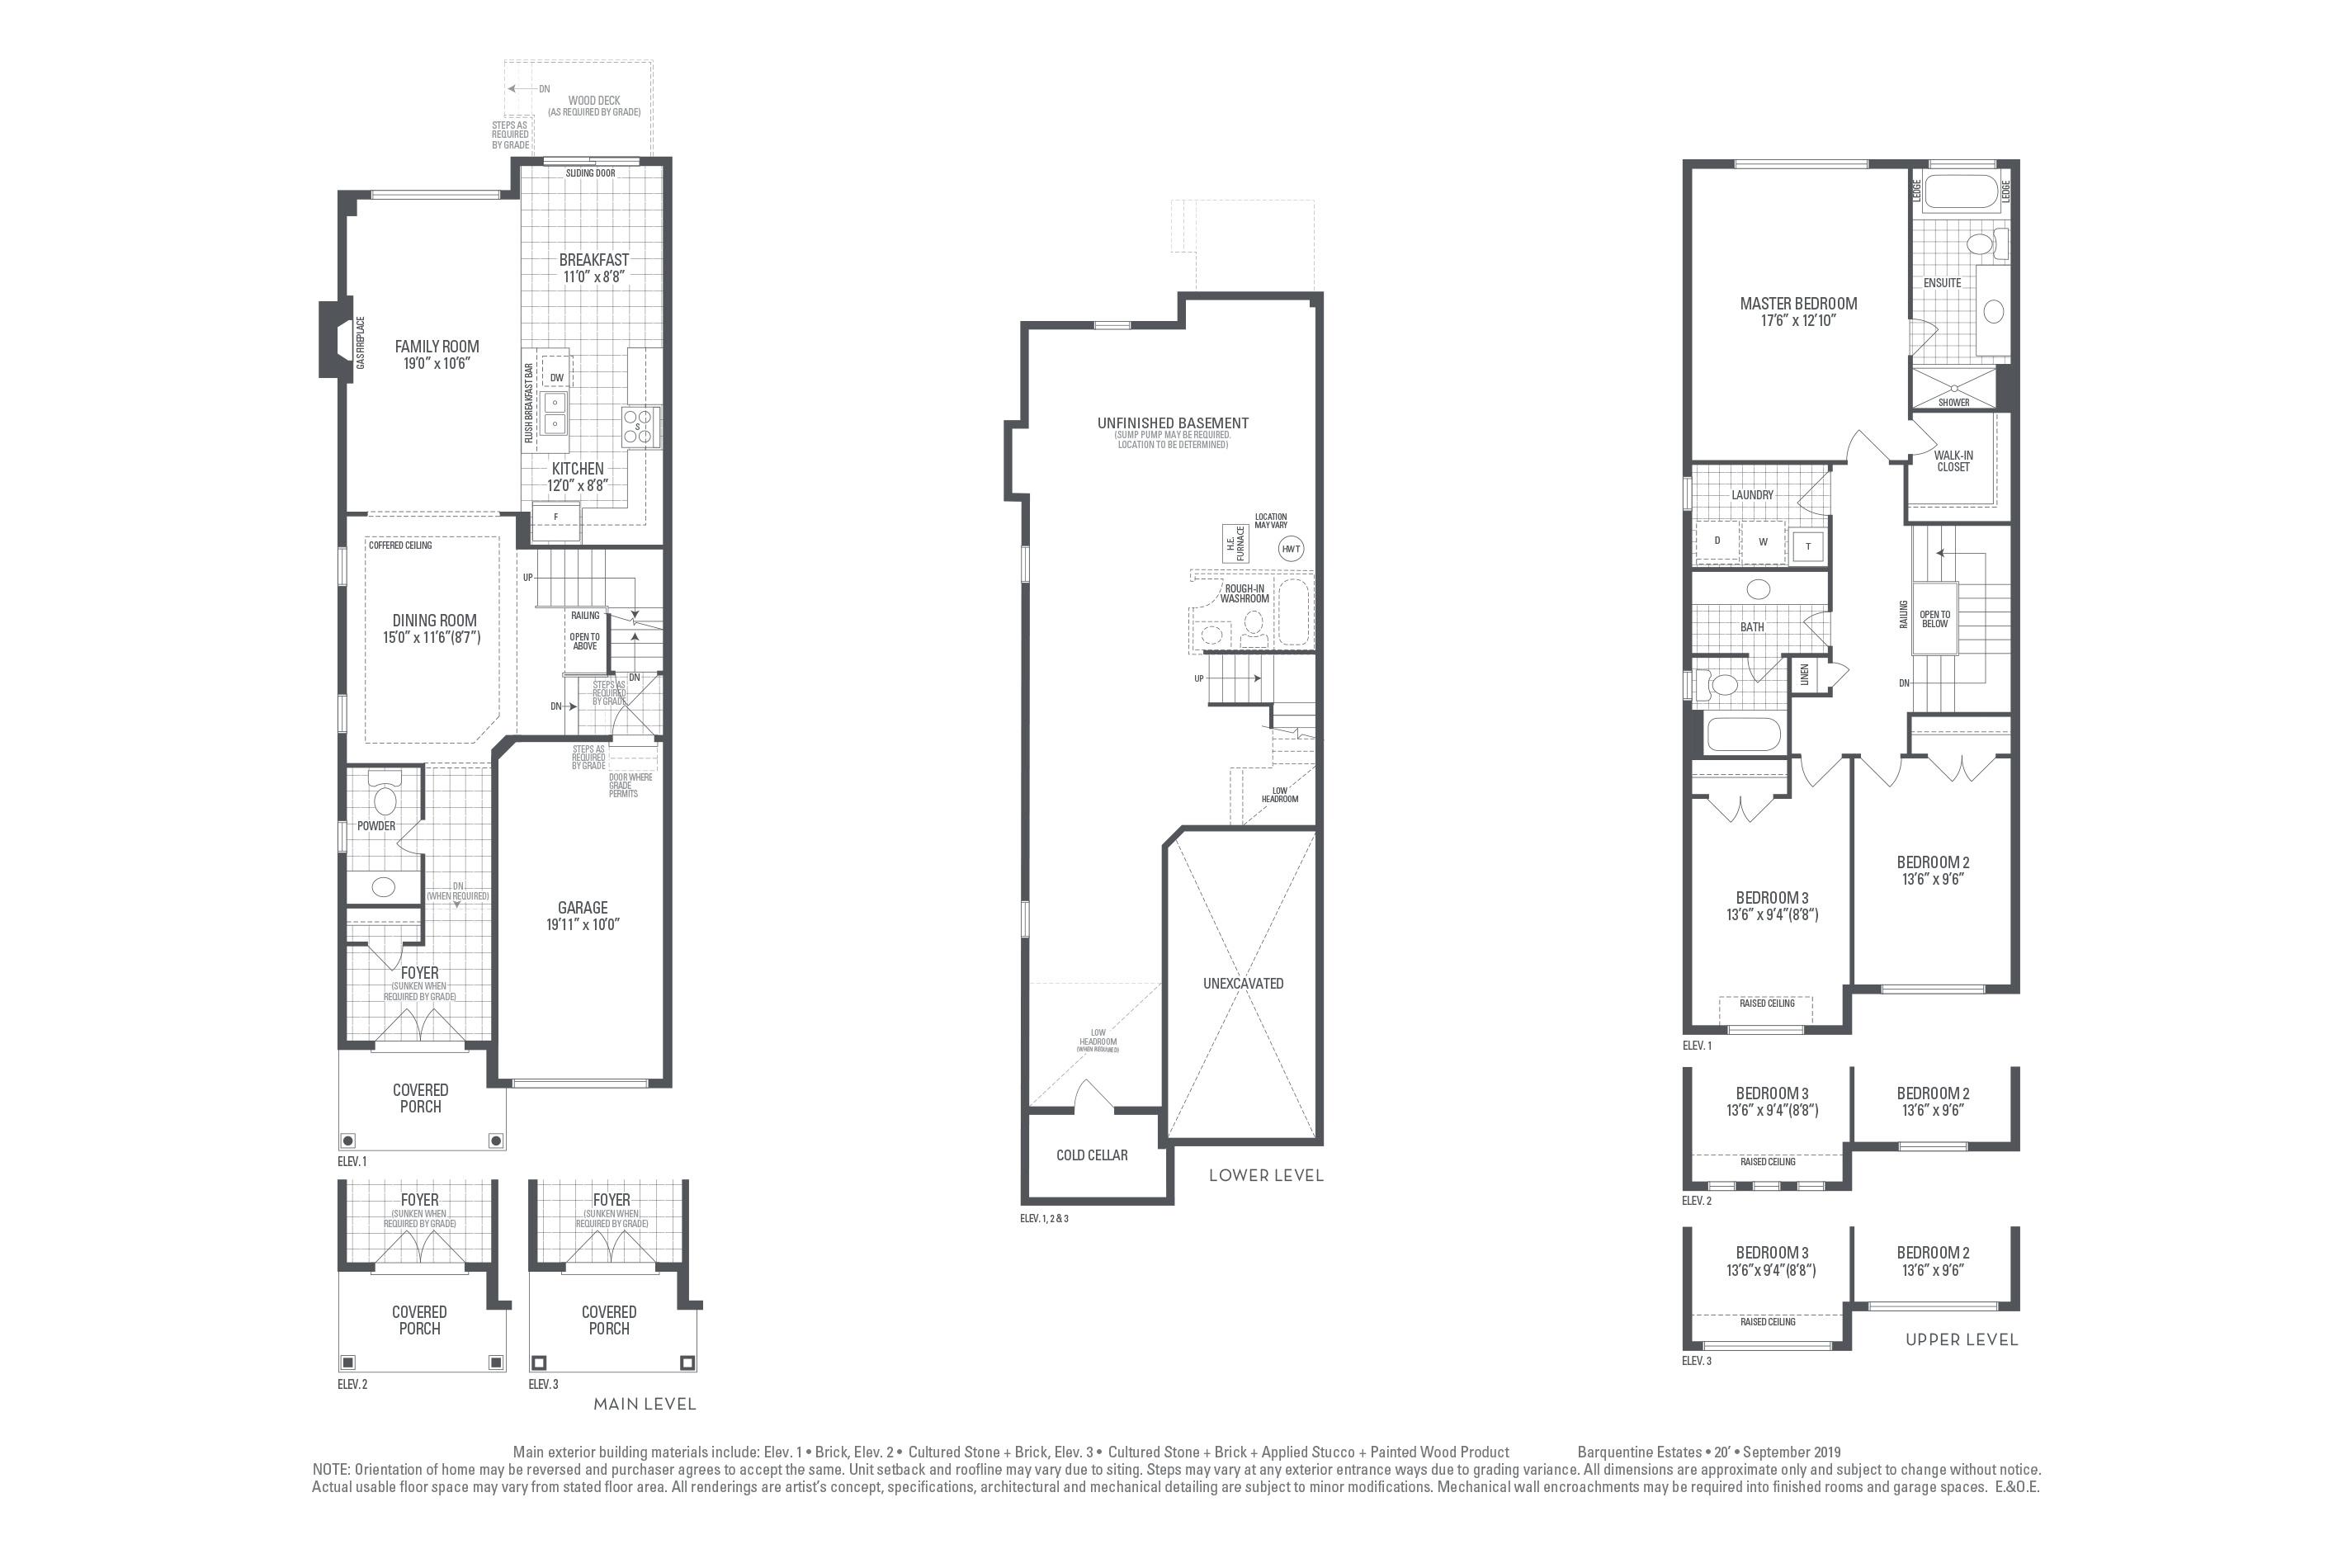 Hudson 05 Elev. 3 Floorplan Thumbnail